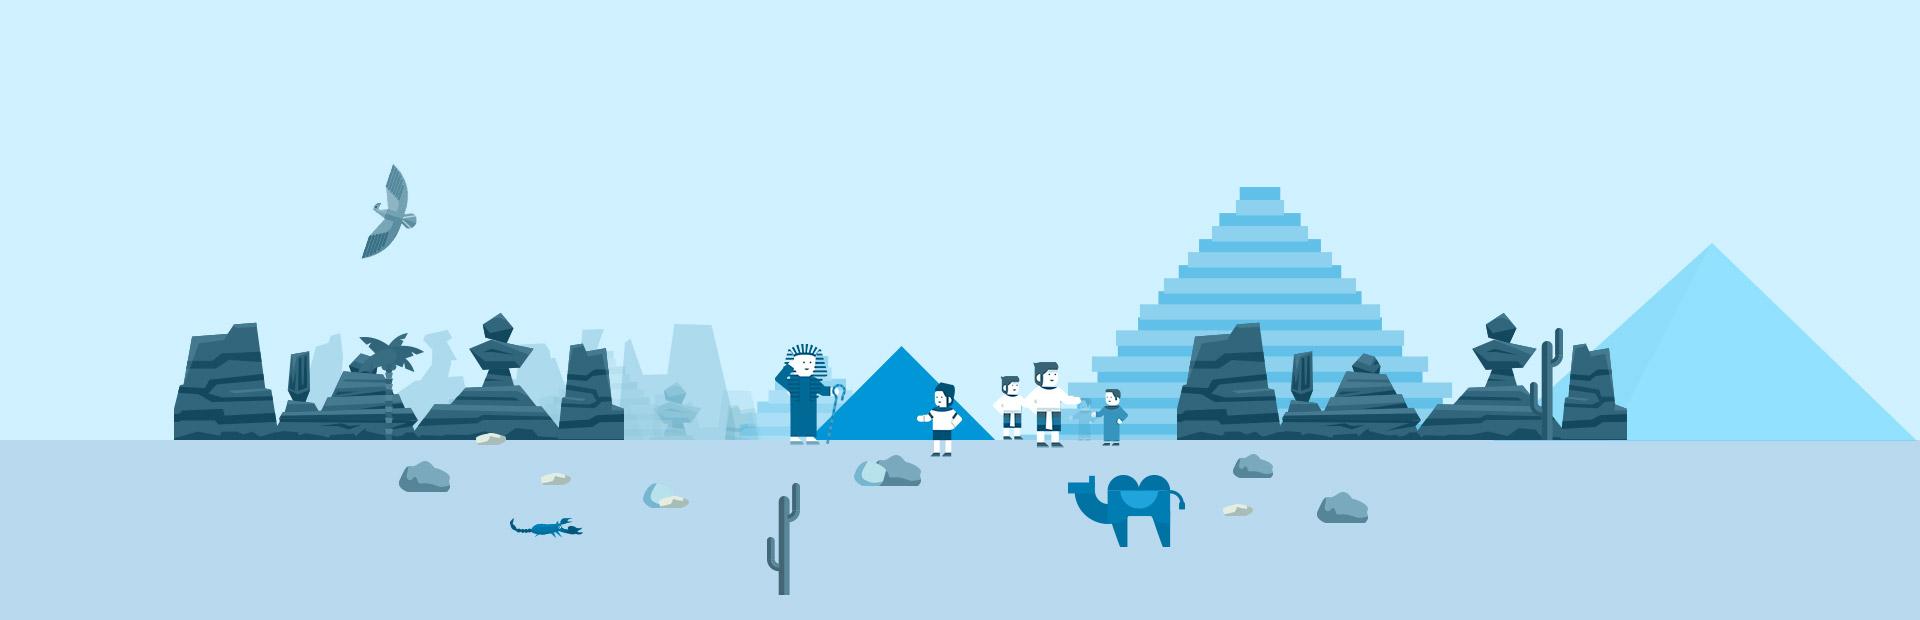 Faraon SVG Animation